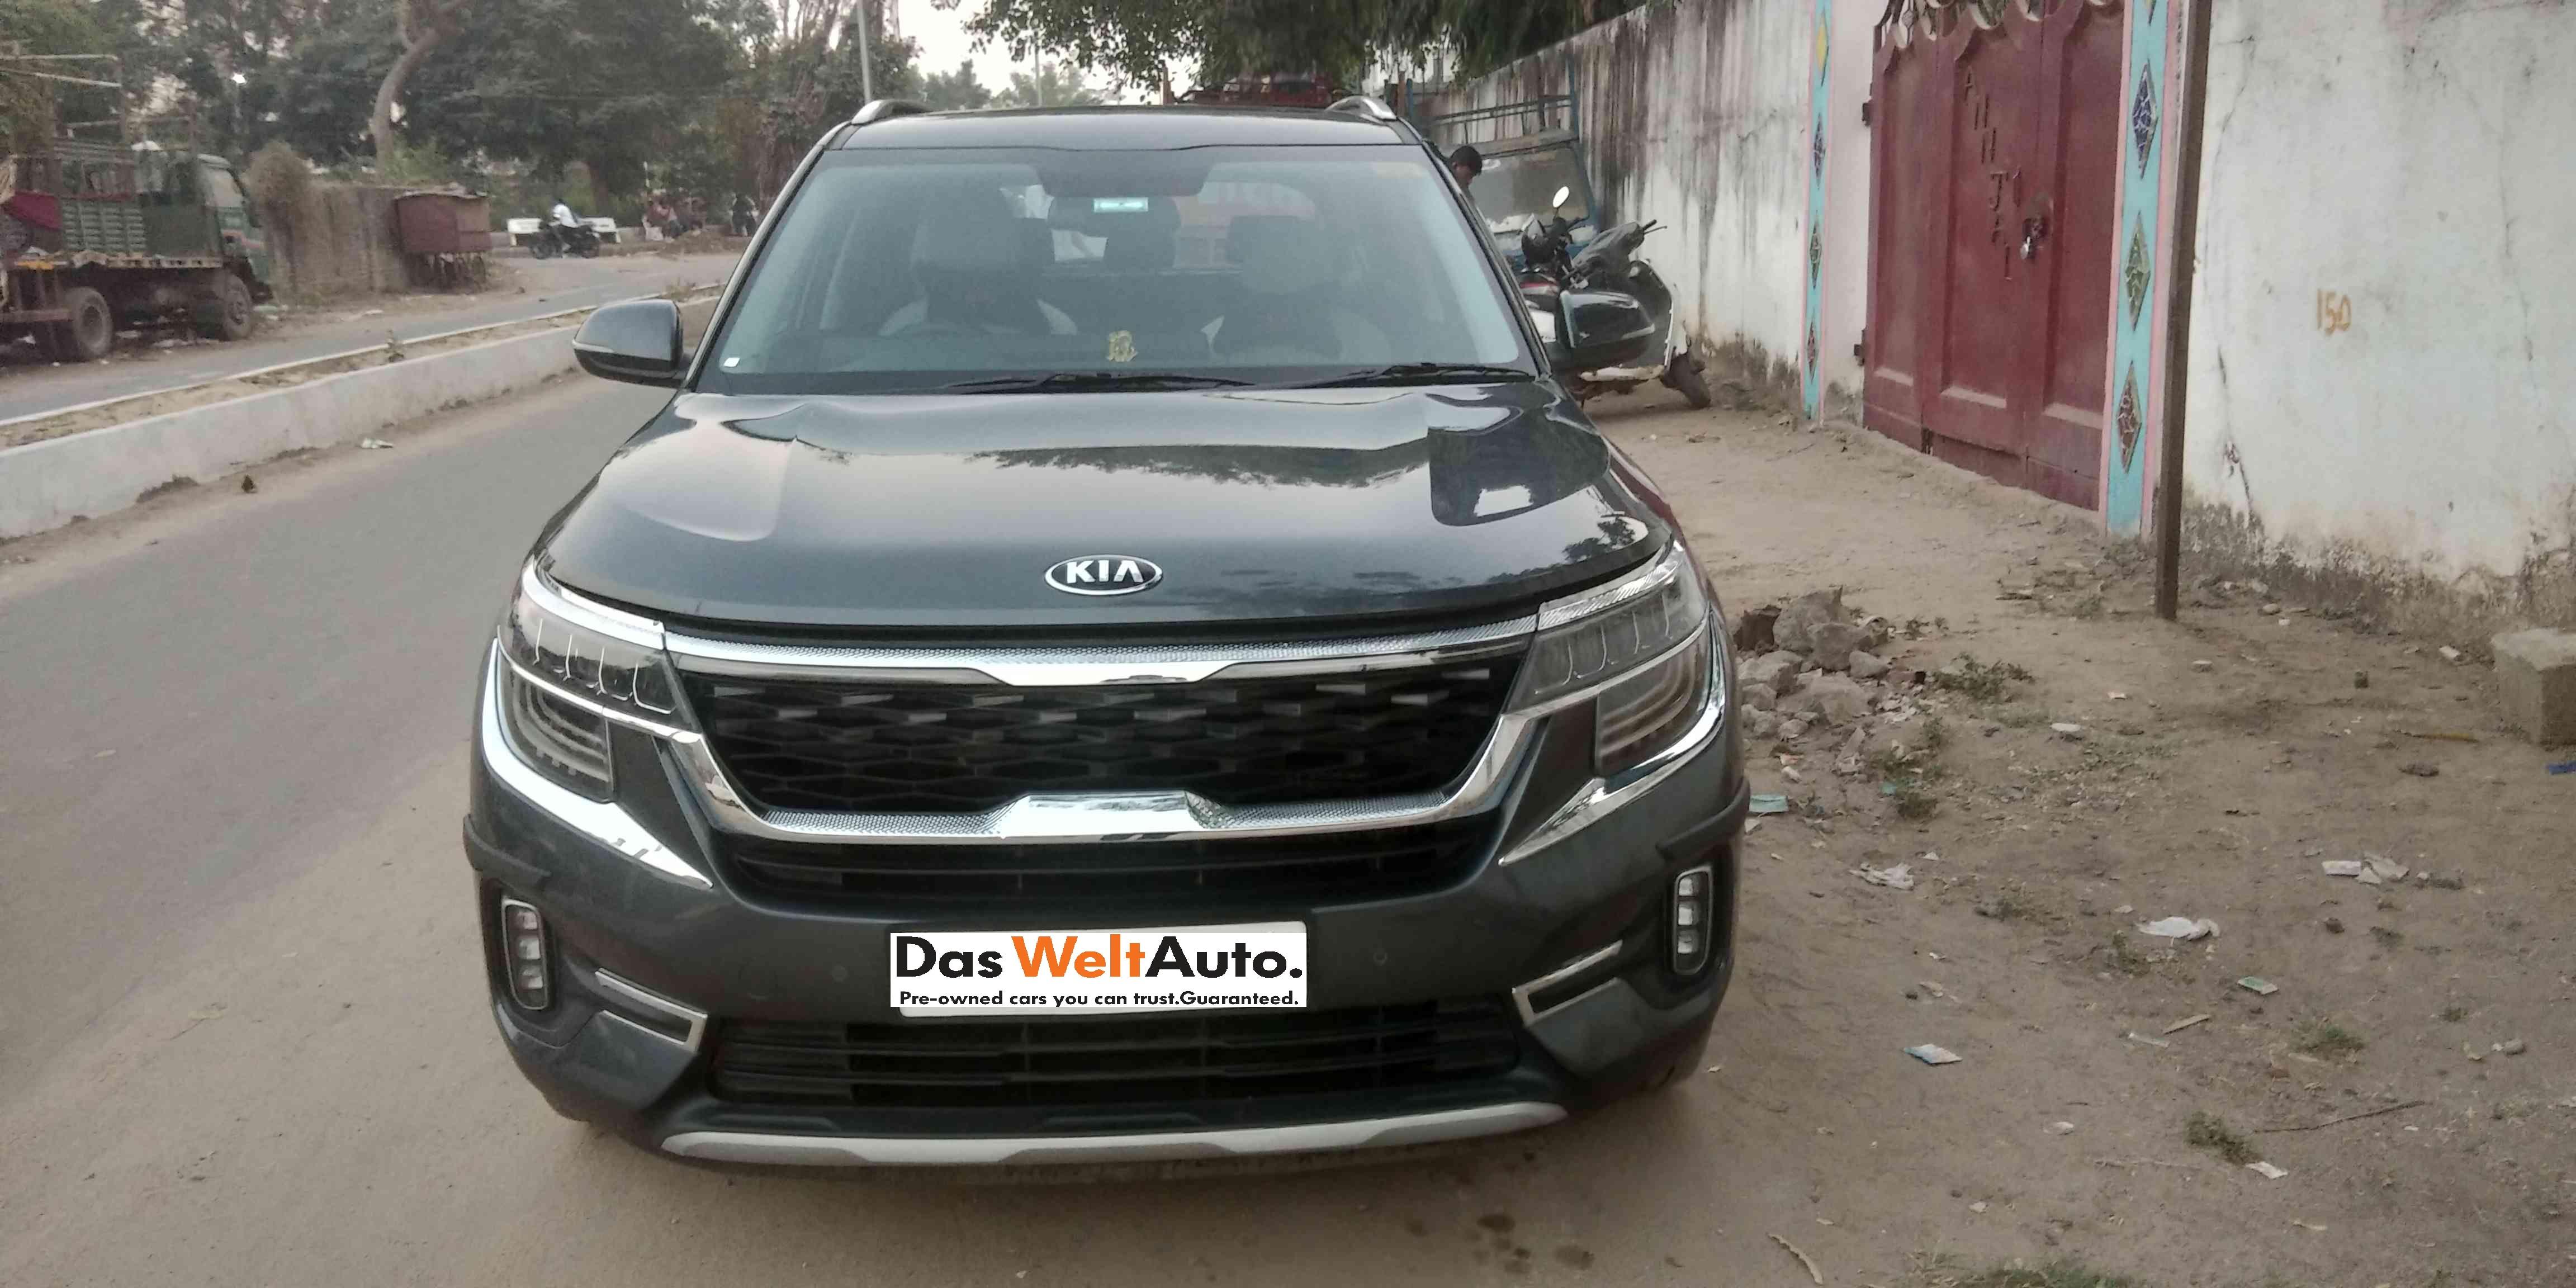 2014 Used Hyundai Grand I10(2013-2017) ASTA 1.2 KAPPA VTVT O